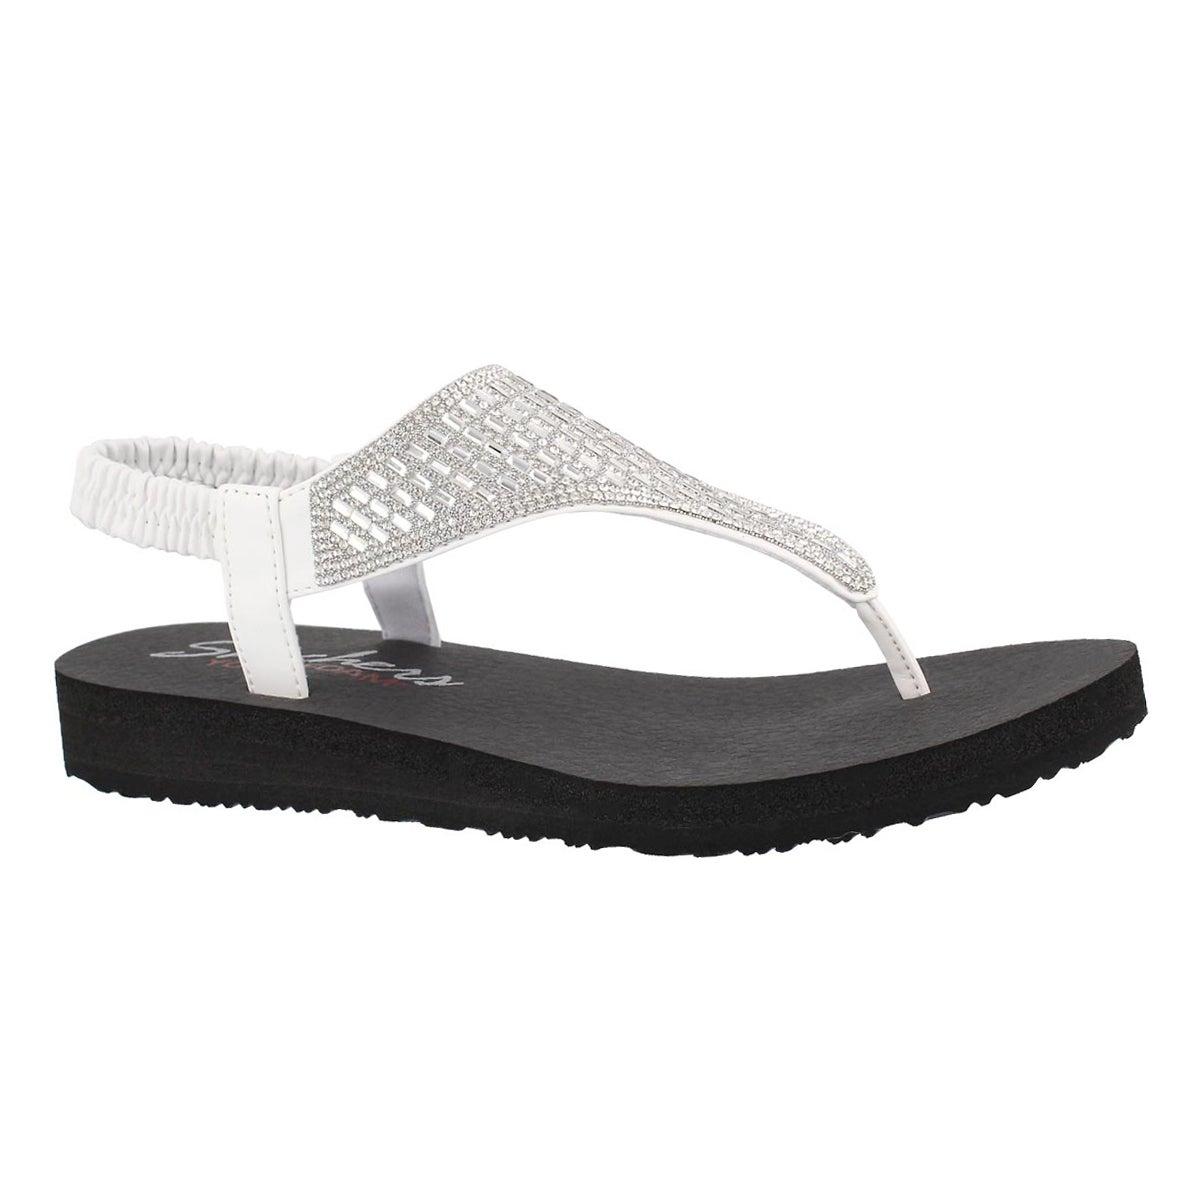 Women's MEDITATION ROCK CROWN wht sandals